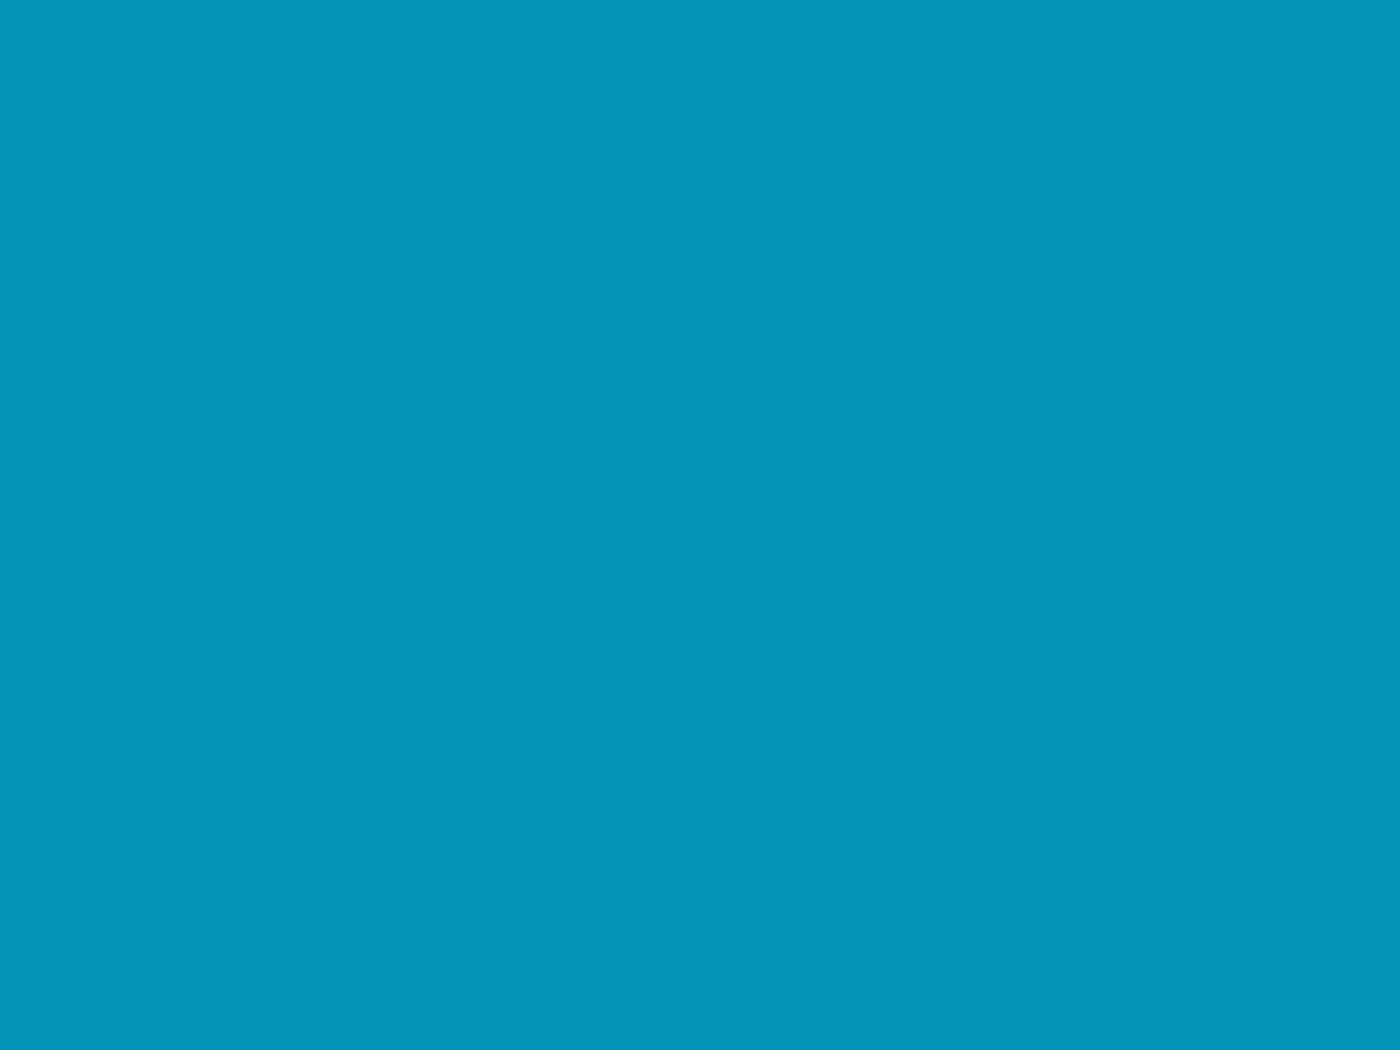 1400x1050 Bondi Blue Solid Color Background